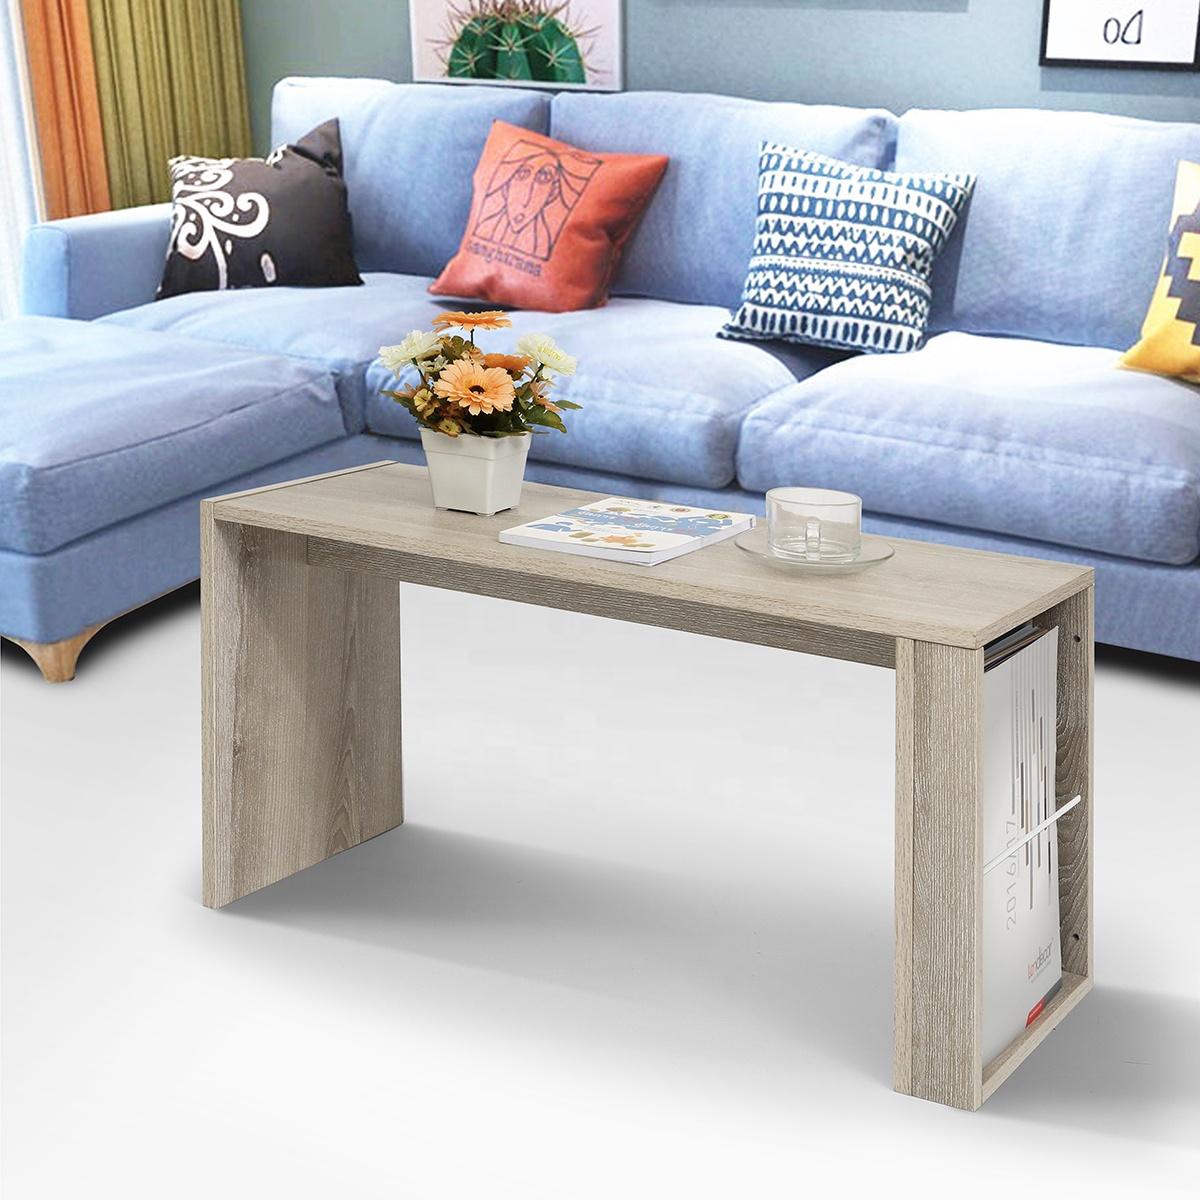 Us Stock Living Room Square Desk Mdf Modern Storage Coffee Table Buy Oak Poker Table Small Size Coffee Table Modern Reception Table Design Product On Alibaba Com